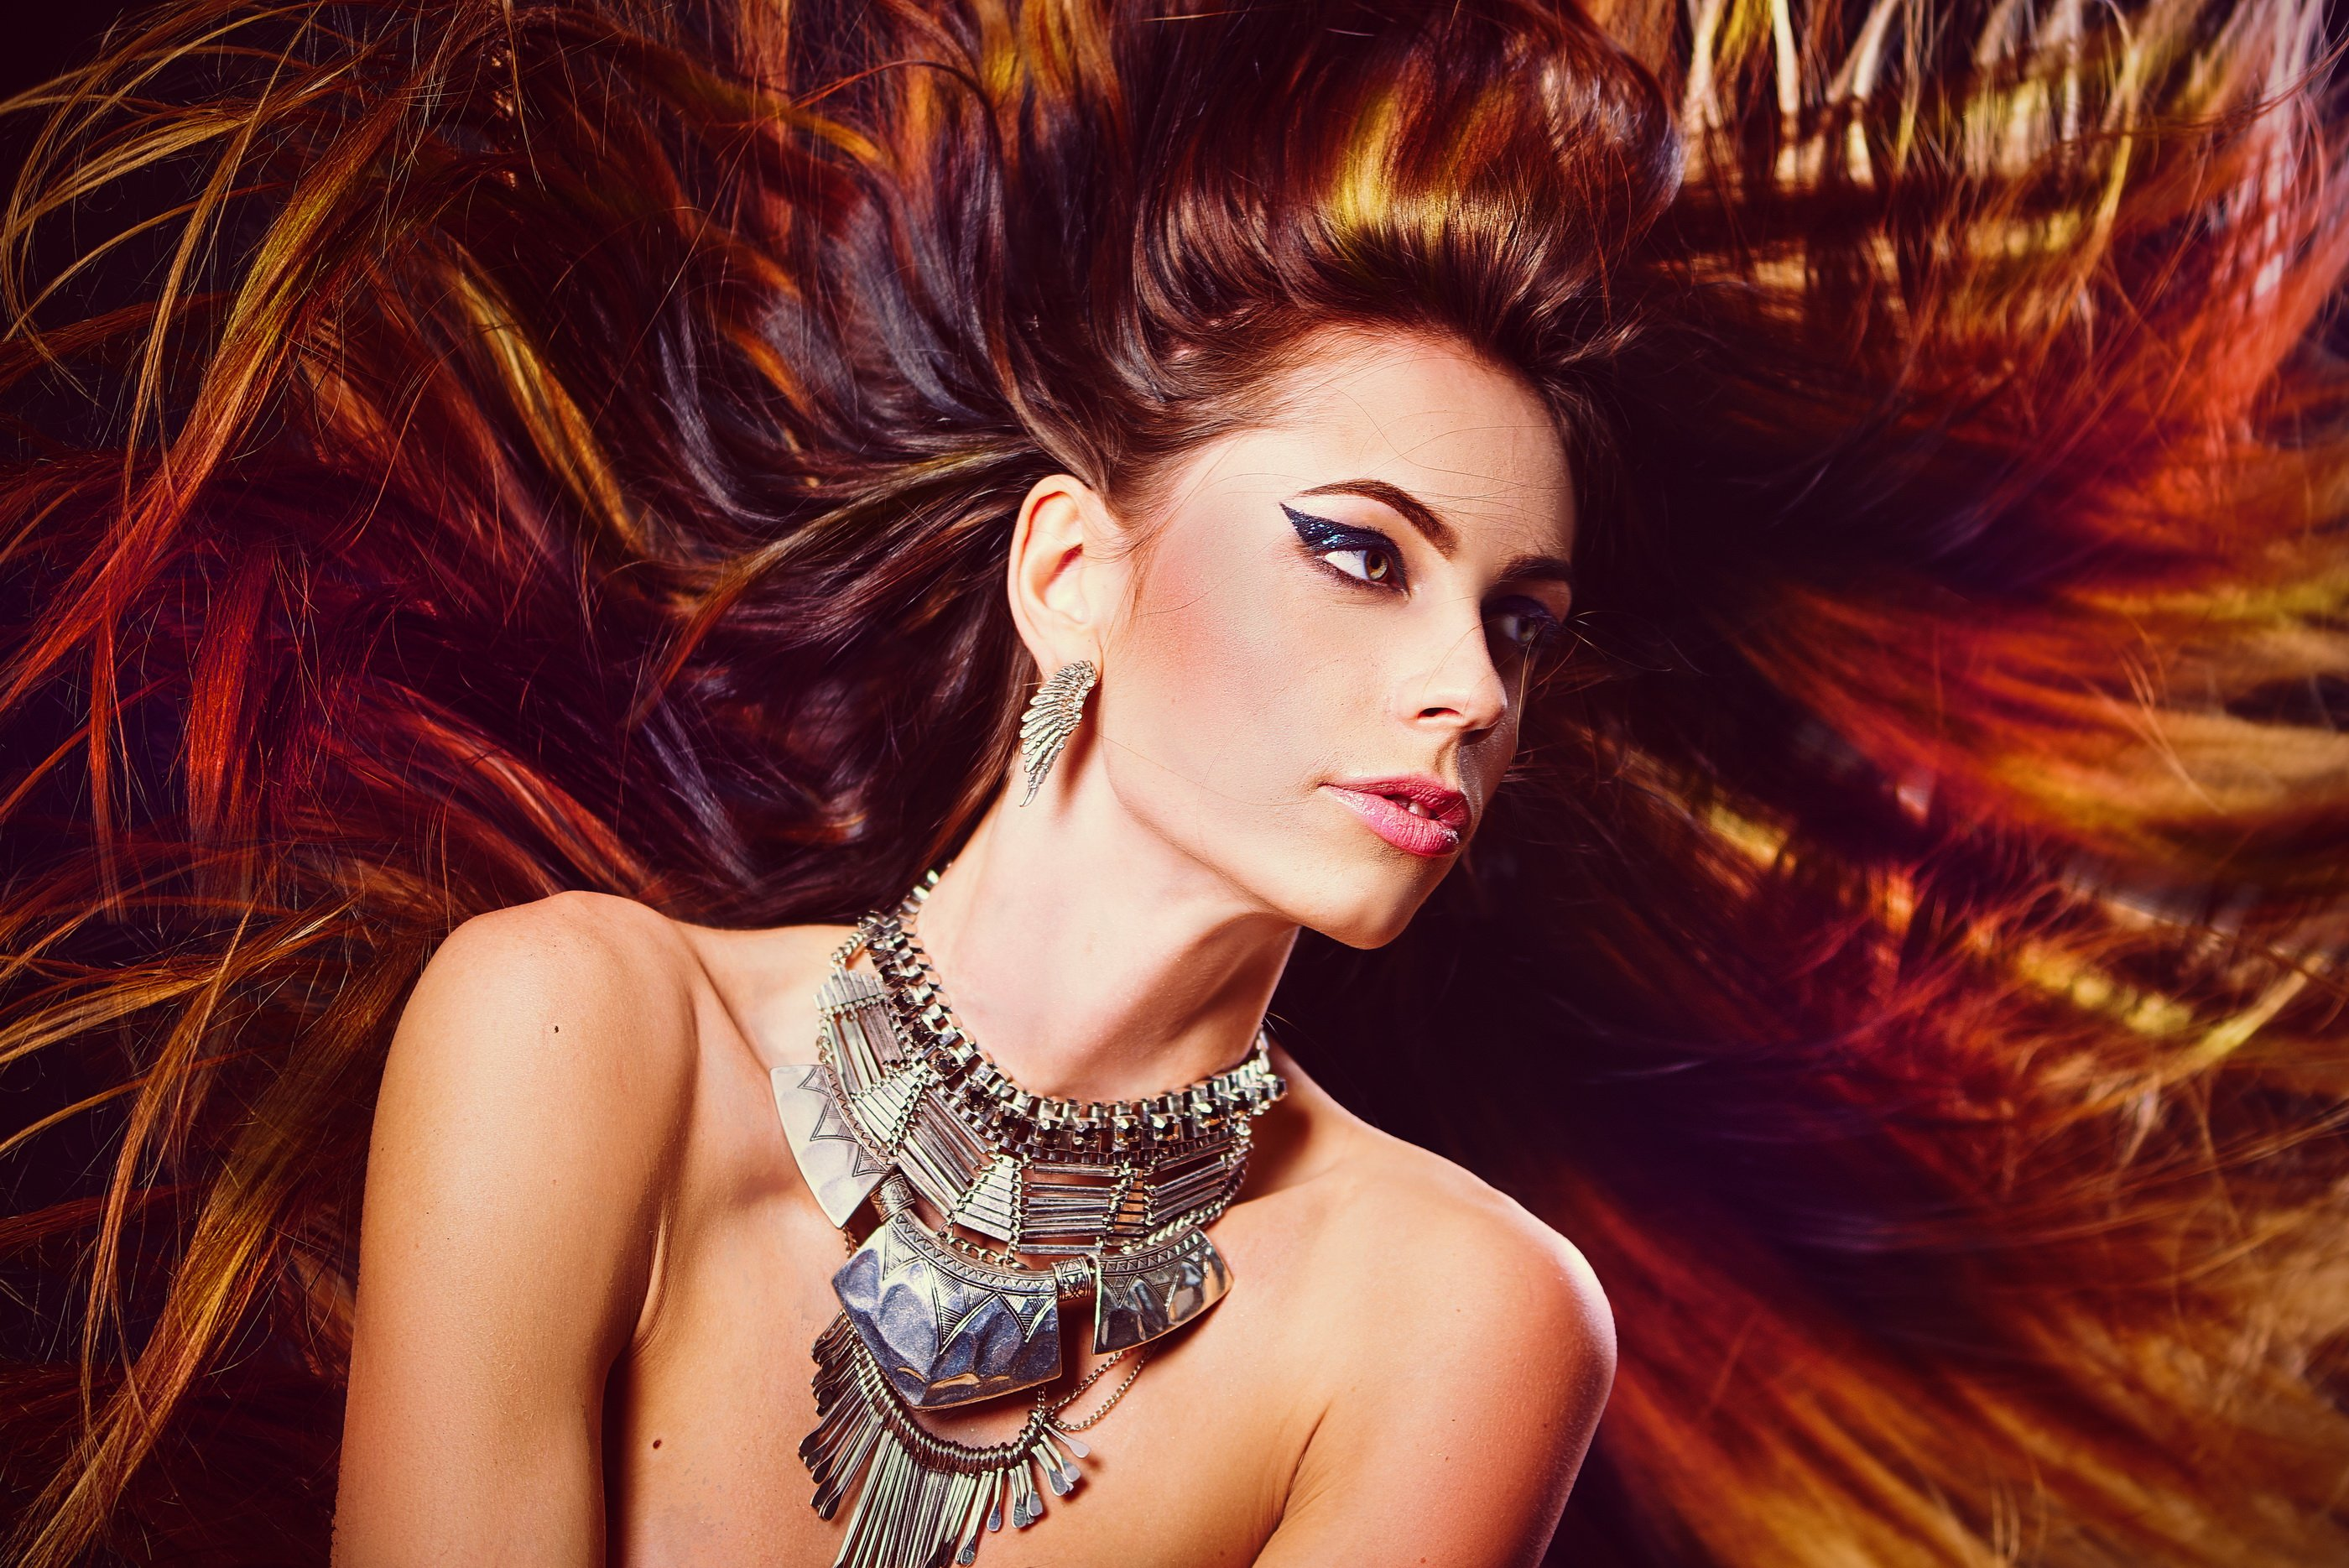 Девушка, украшения, волосы, гламур, декоративно, макияж, ветер, студия, , Матвеева Вероника